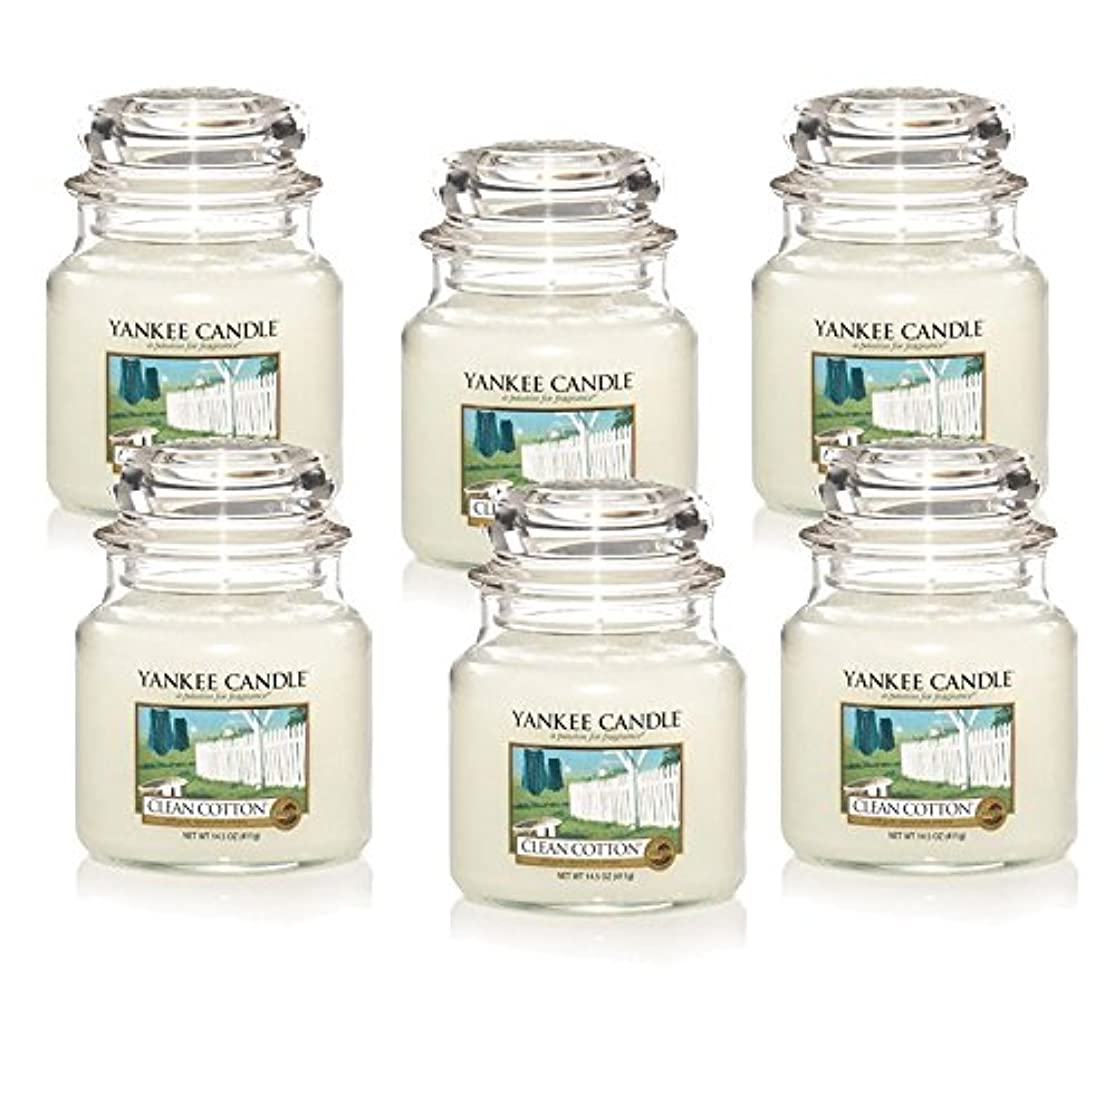 中傷追放検体Yankee Candle Company Clean Cotton 14.5-Ounce Jar Candle, Medium, Set of 6 [並行輸入品]